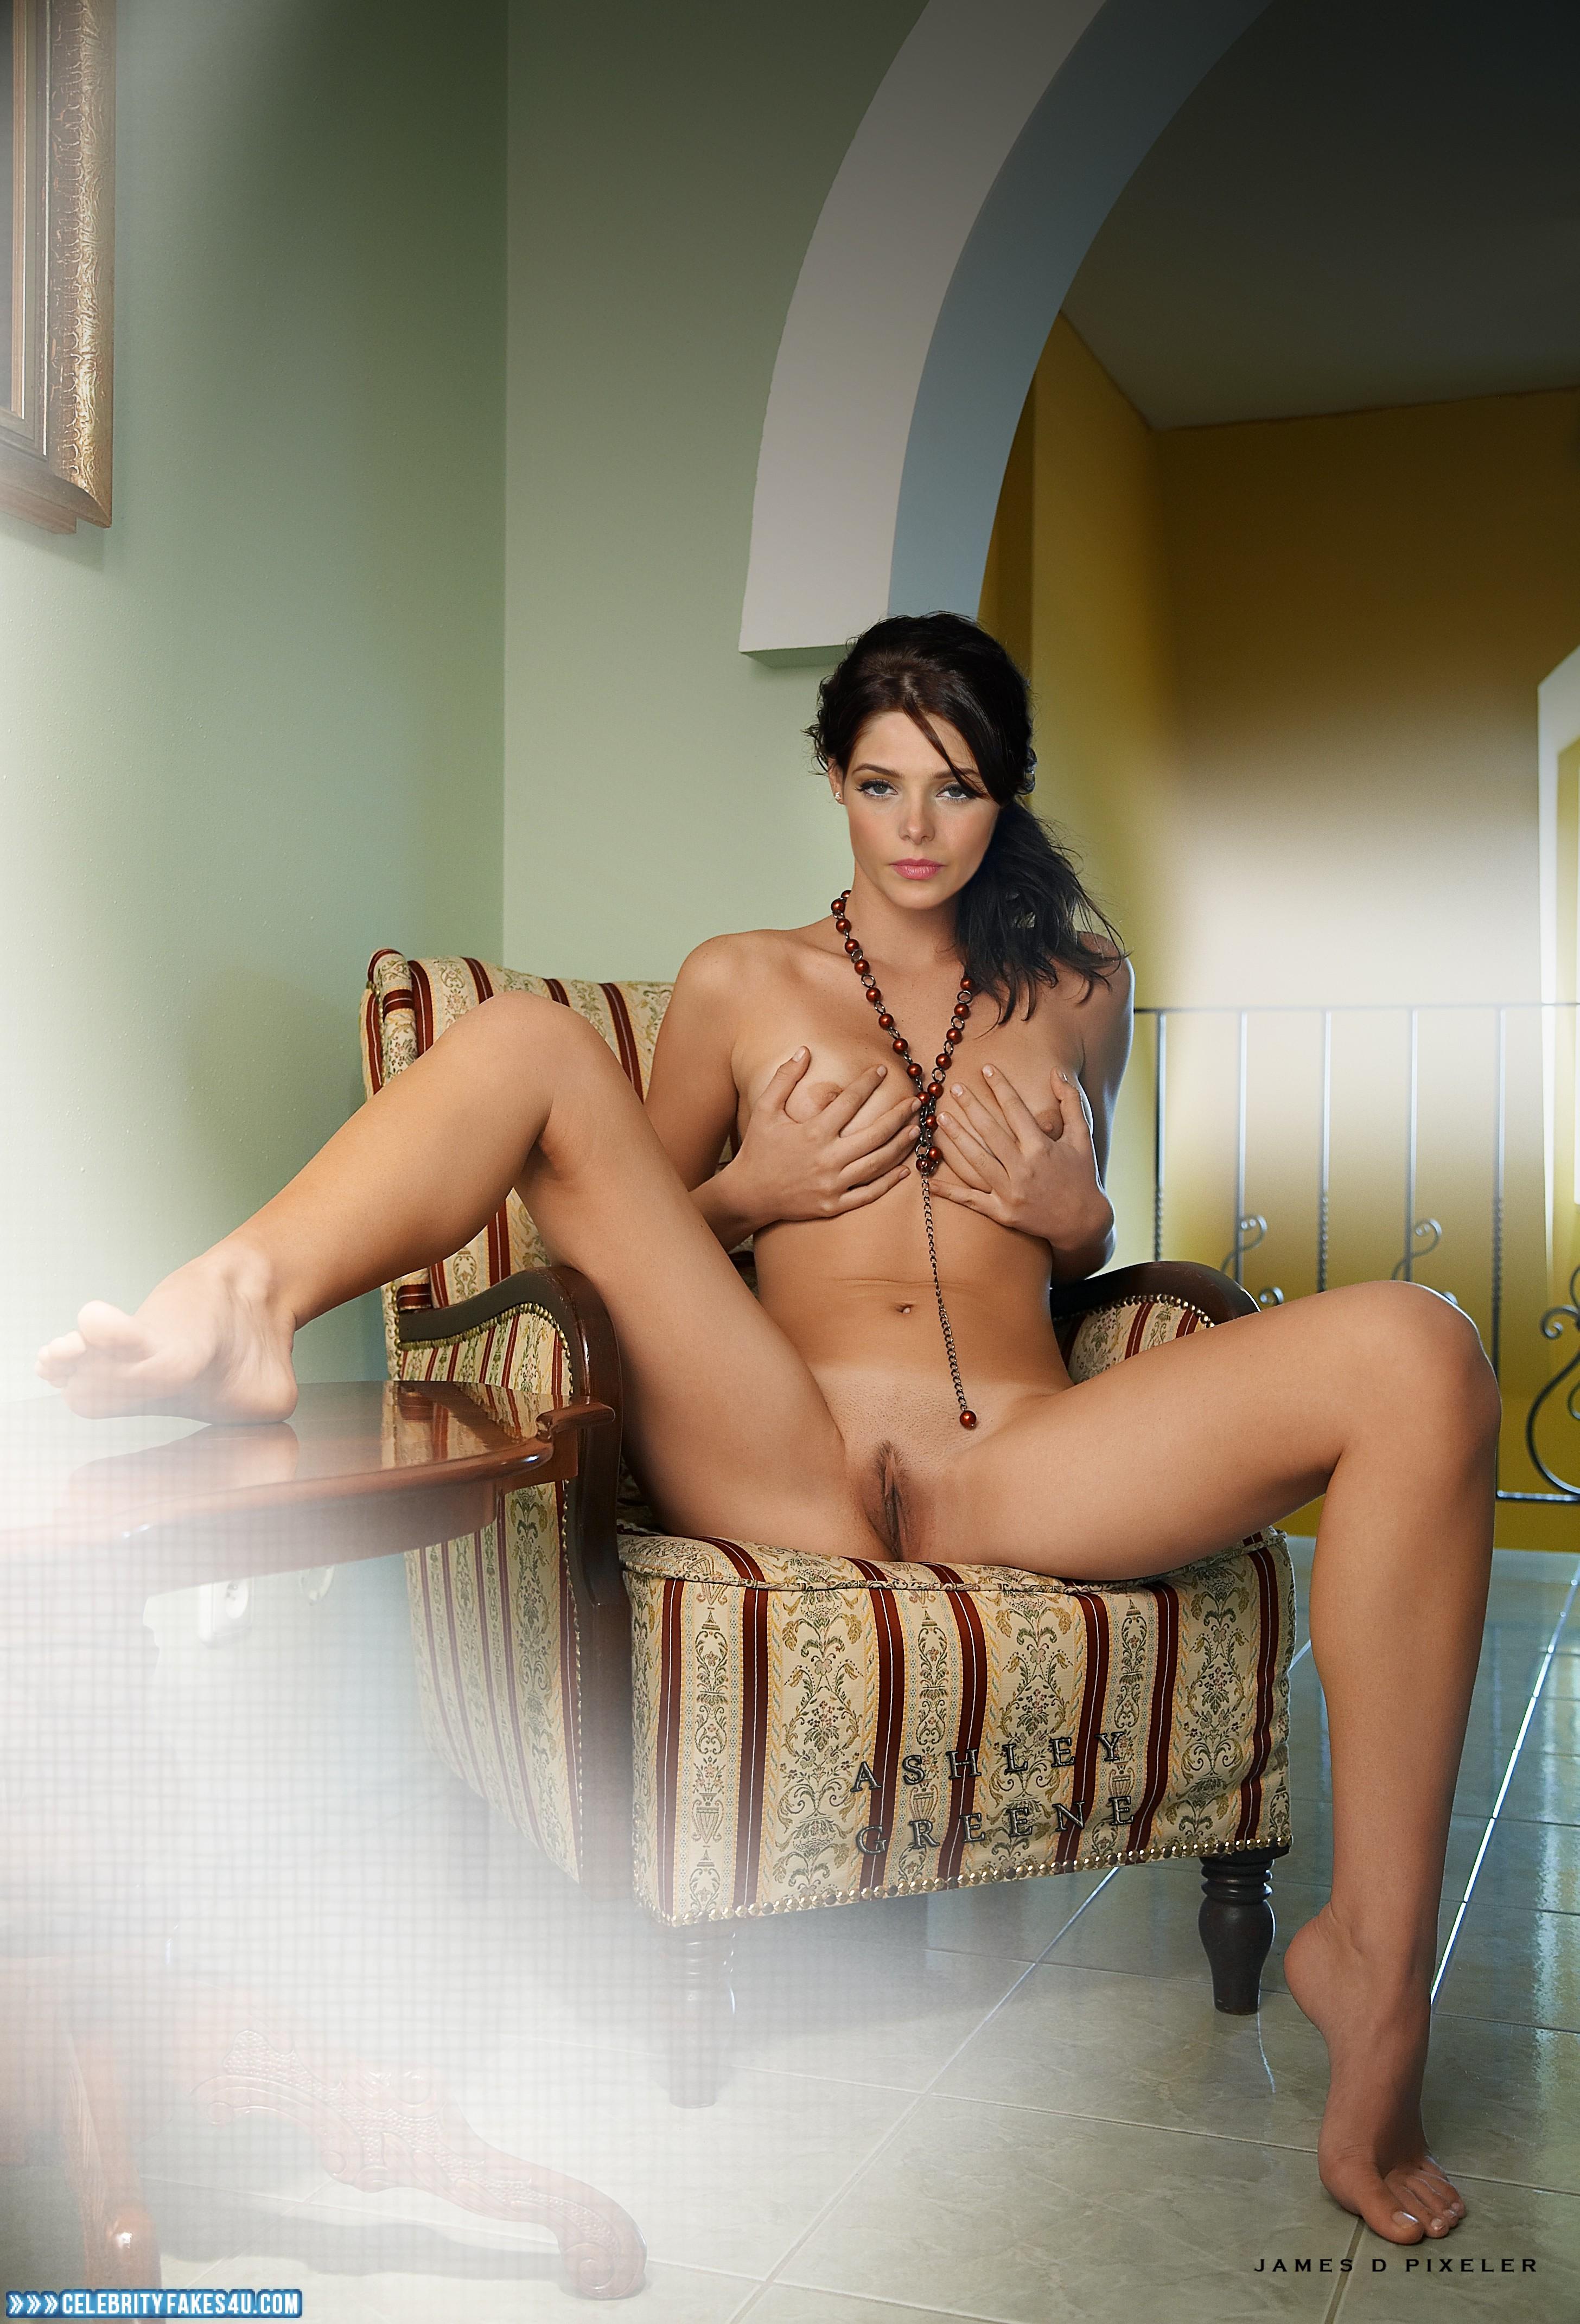 Ballerina fetish pics